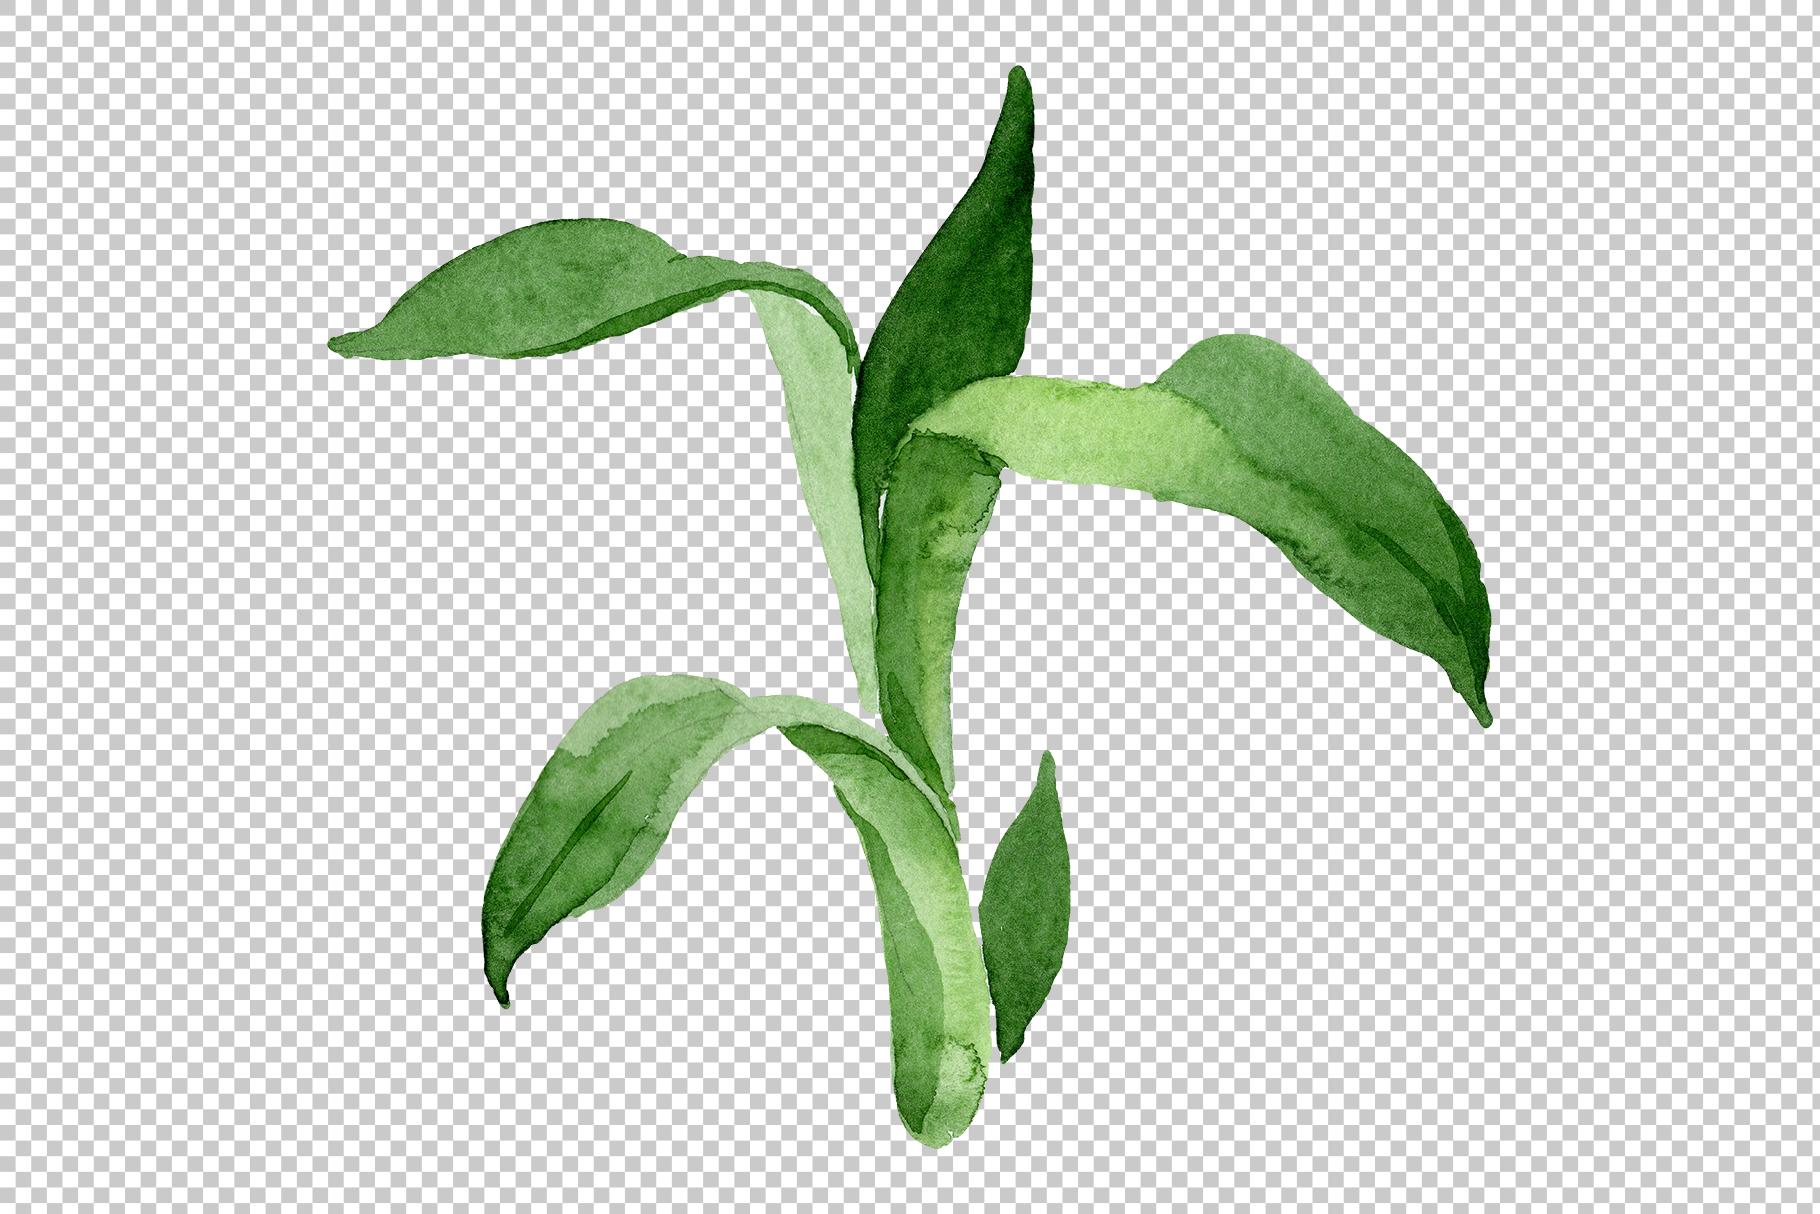 Bamboo Sanderica Drazen Watercolor png example image 2